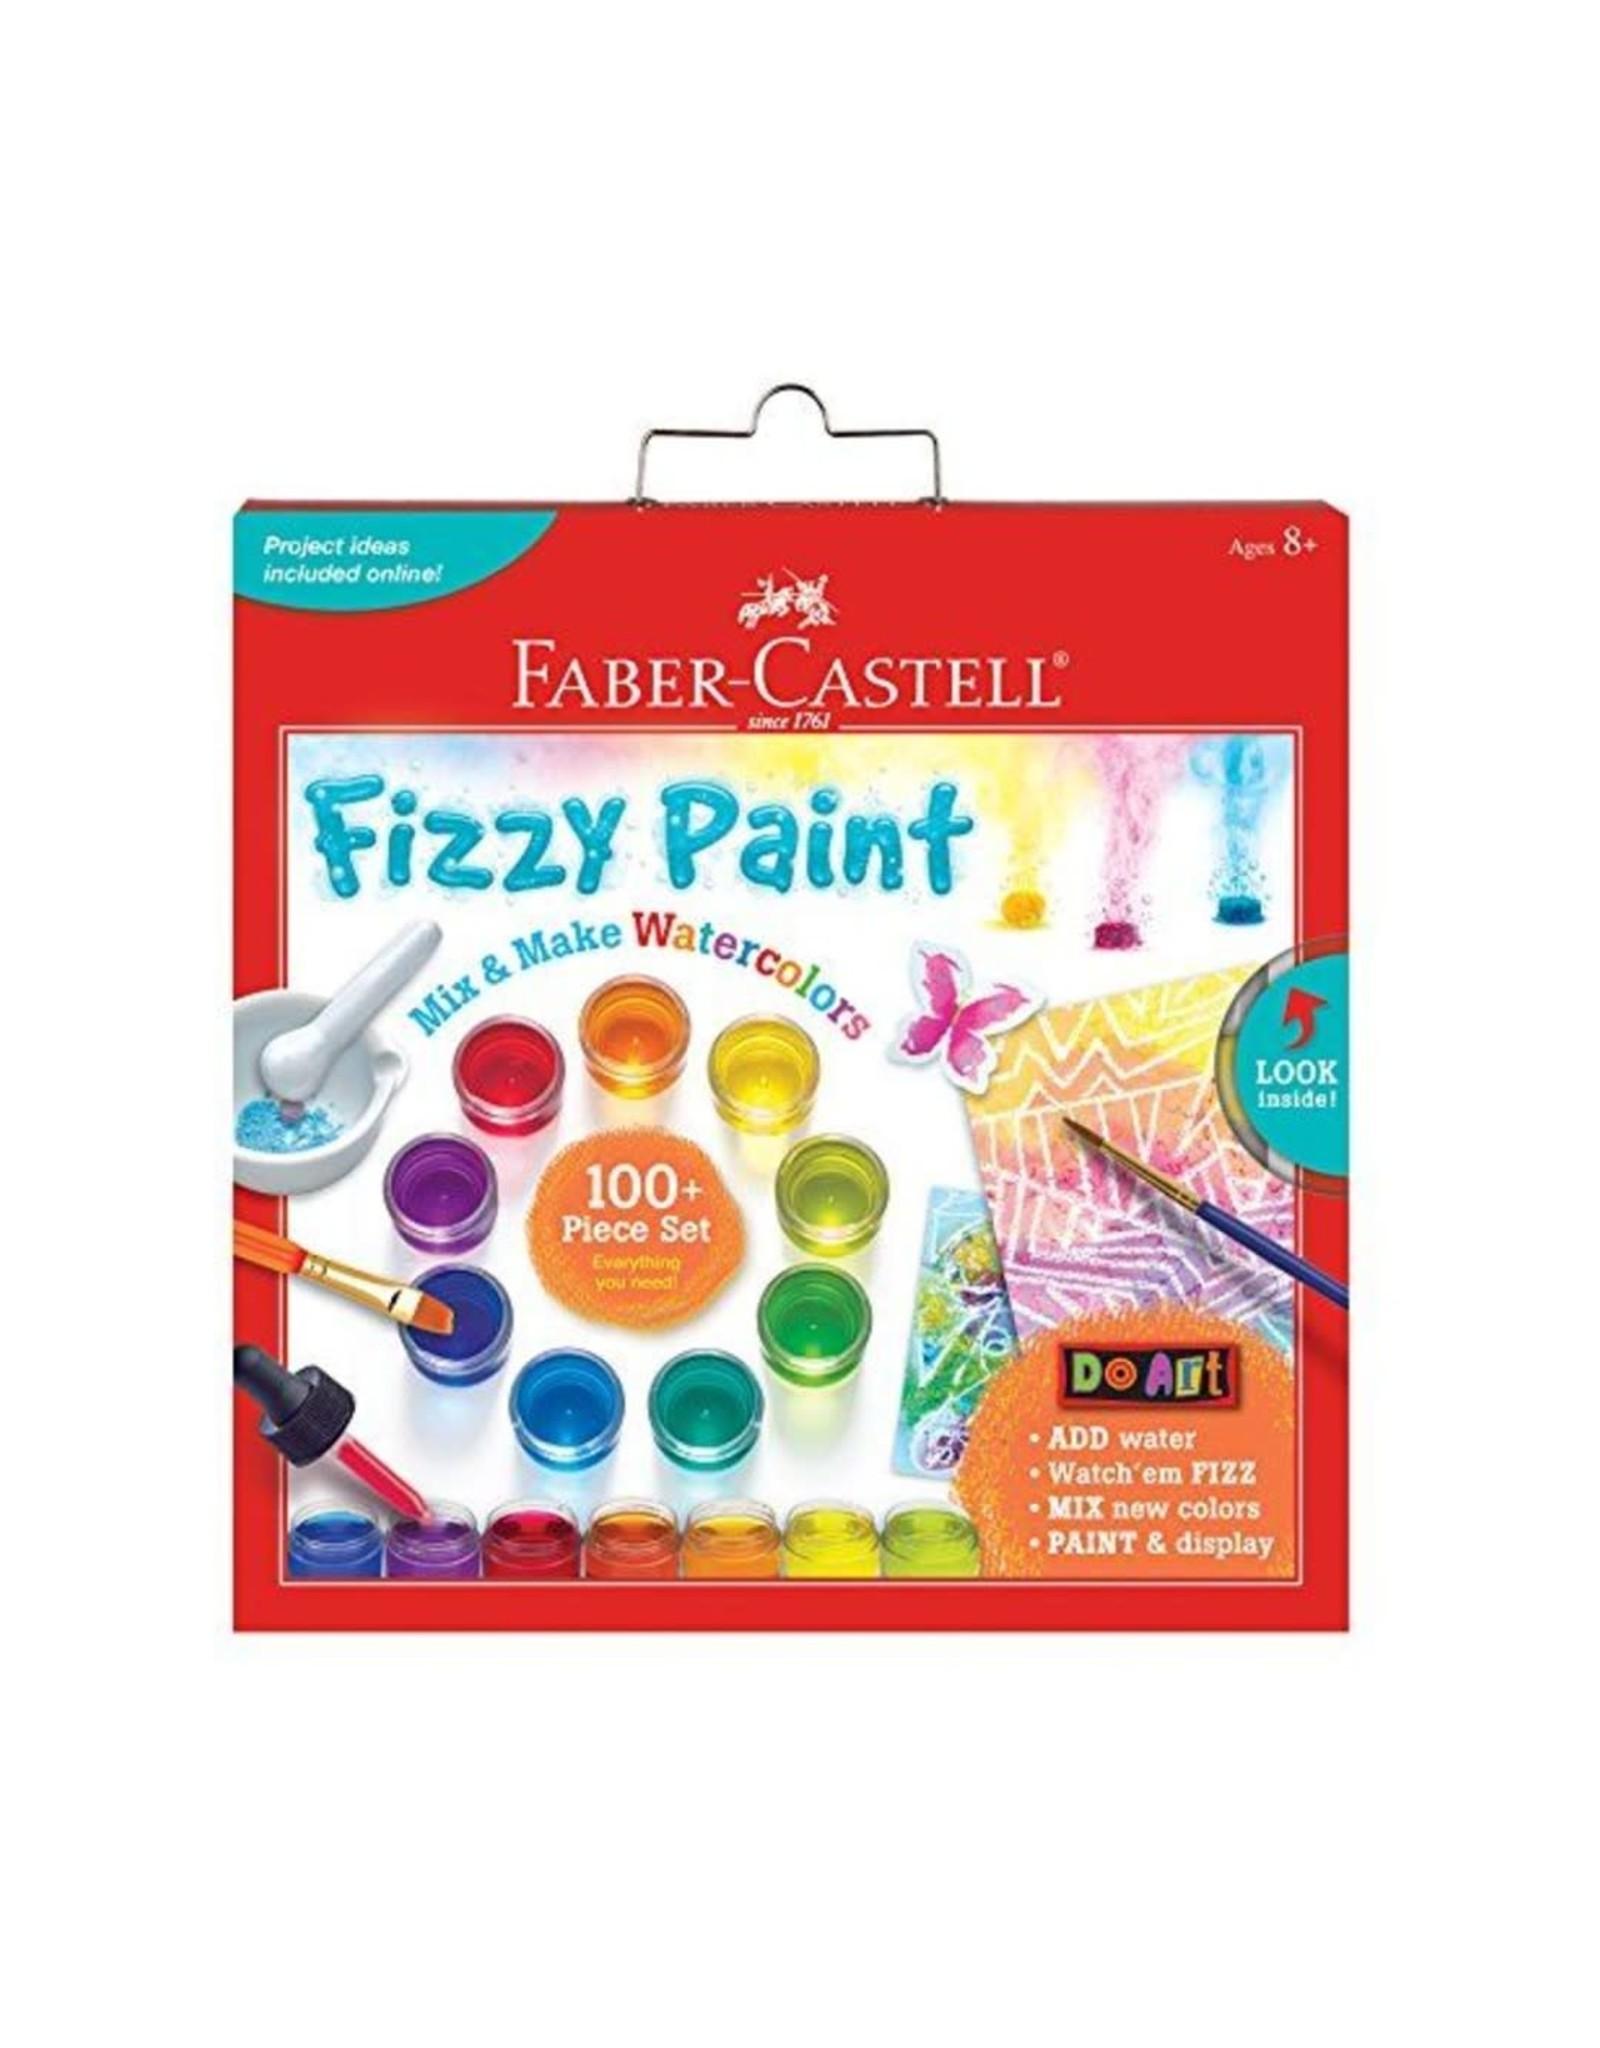 Faber-Castell Do Art Fizzy Paint Mix & Make Colors